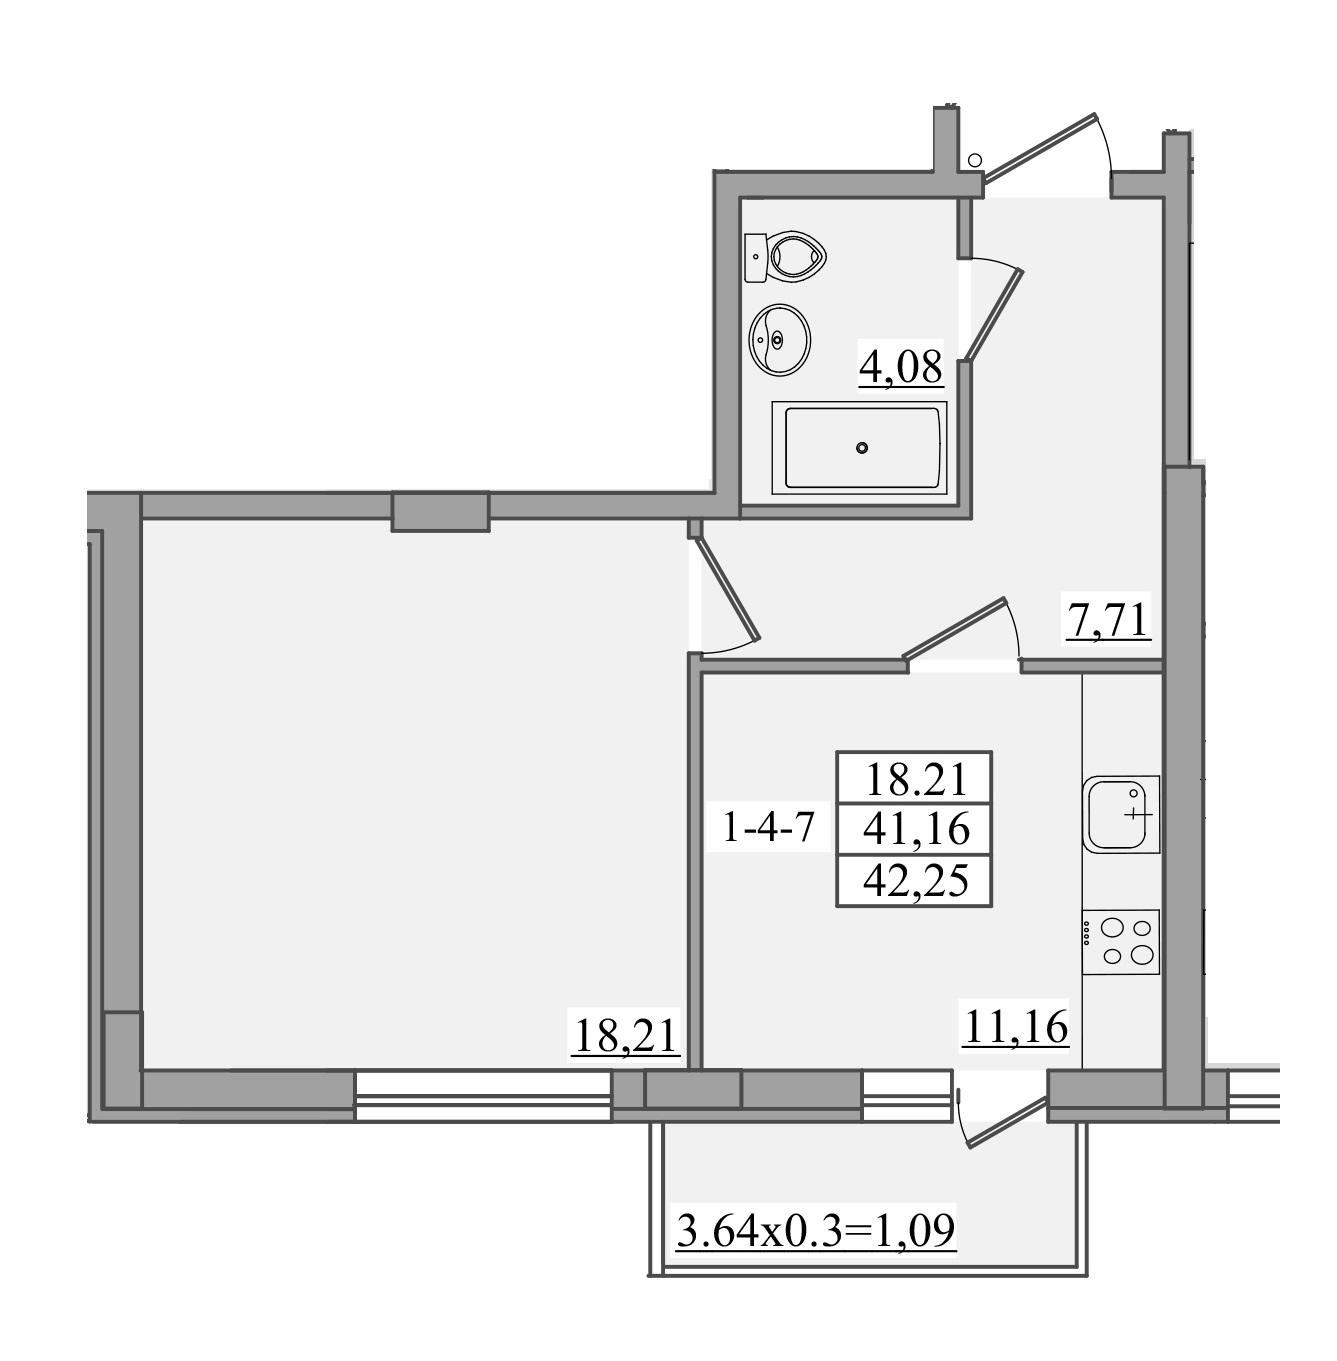 Однокомнатная - ЖК Платинум Резиденс Platinum Residence$39715Площадь:42,25m²